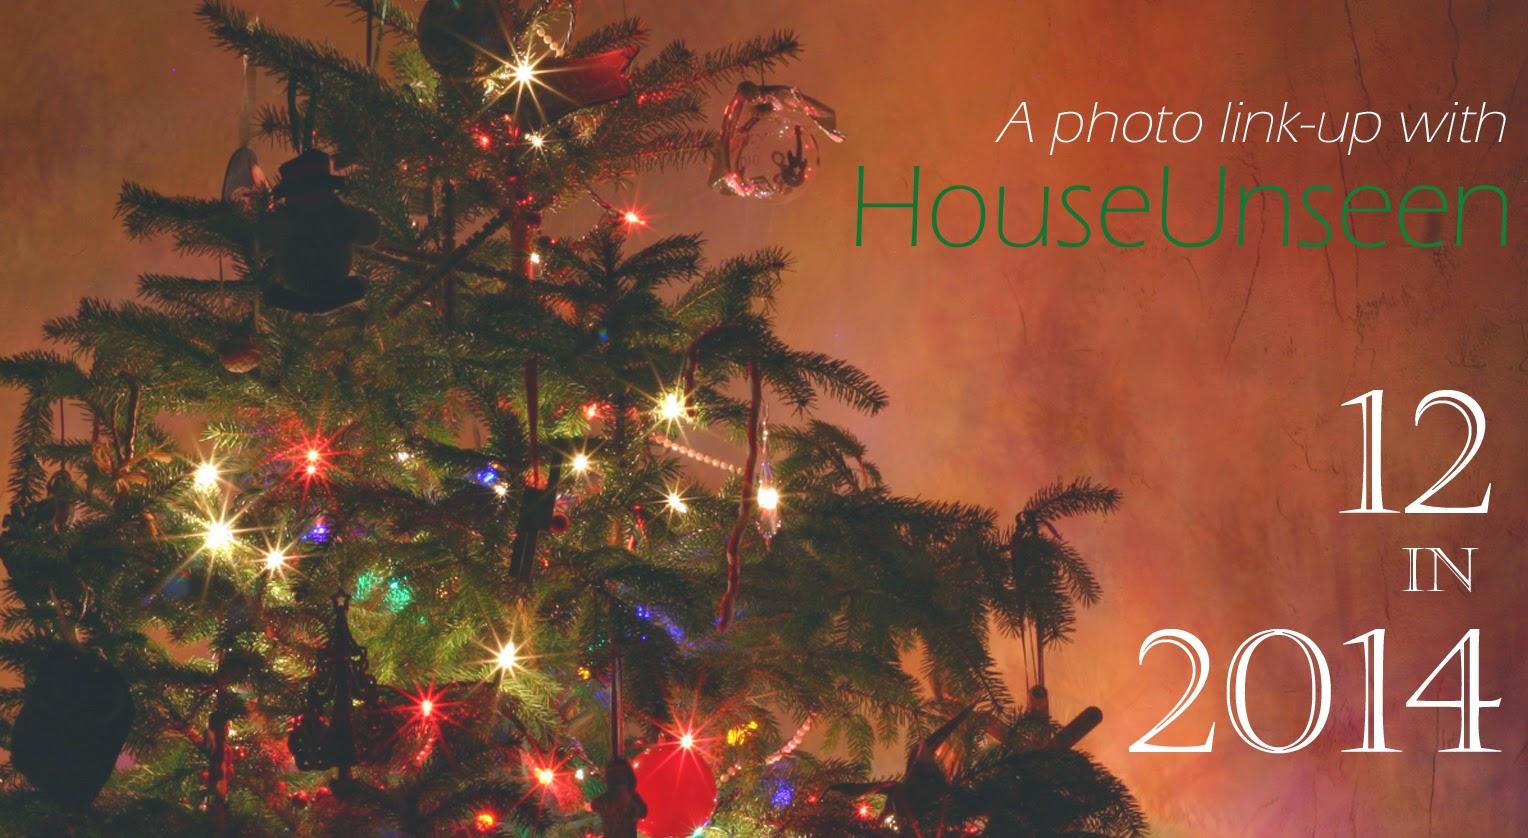 http://www.houseunseen.com/2014/12/12-in-2014-link-up.html